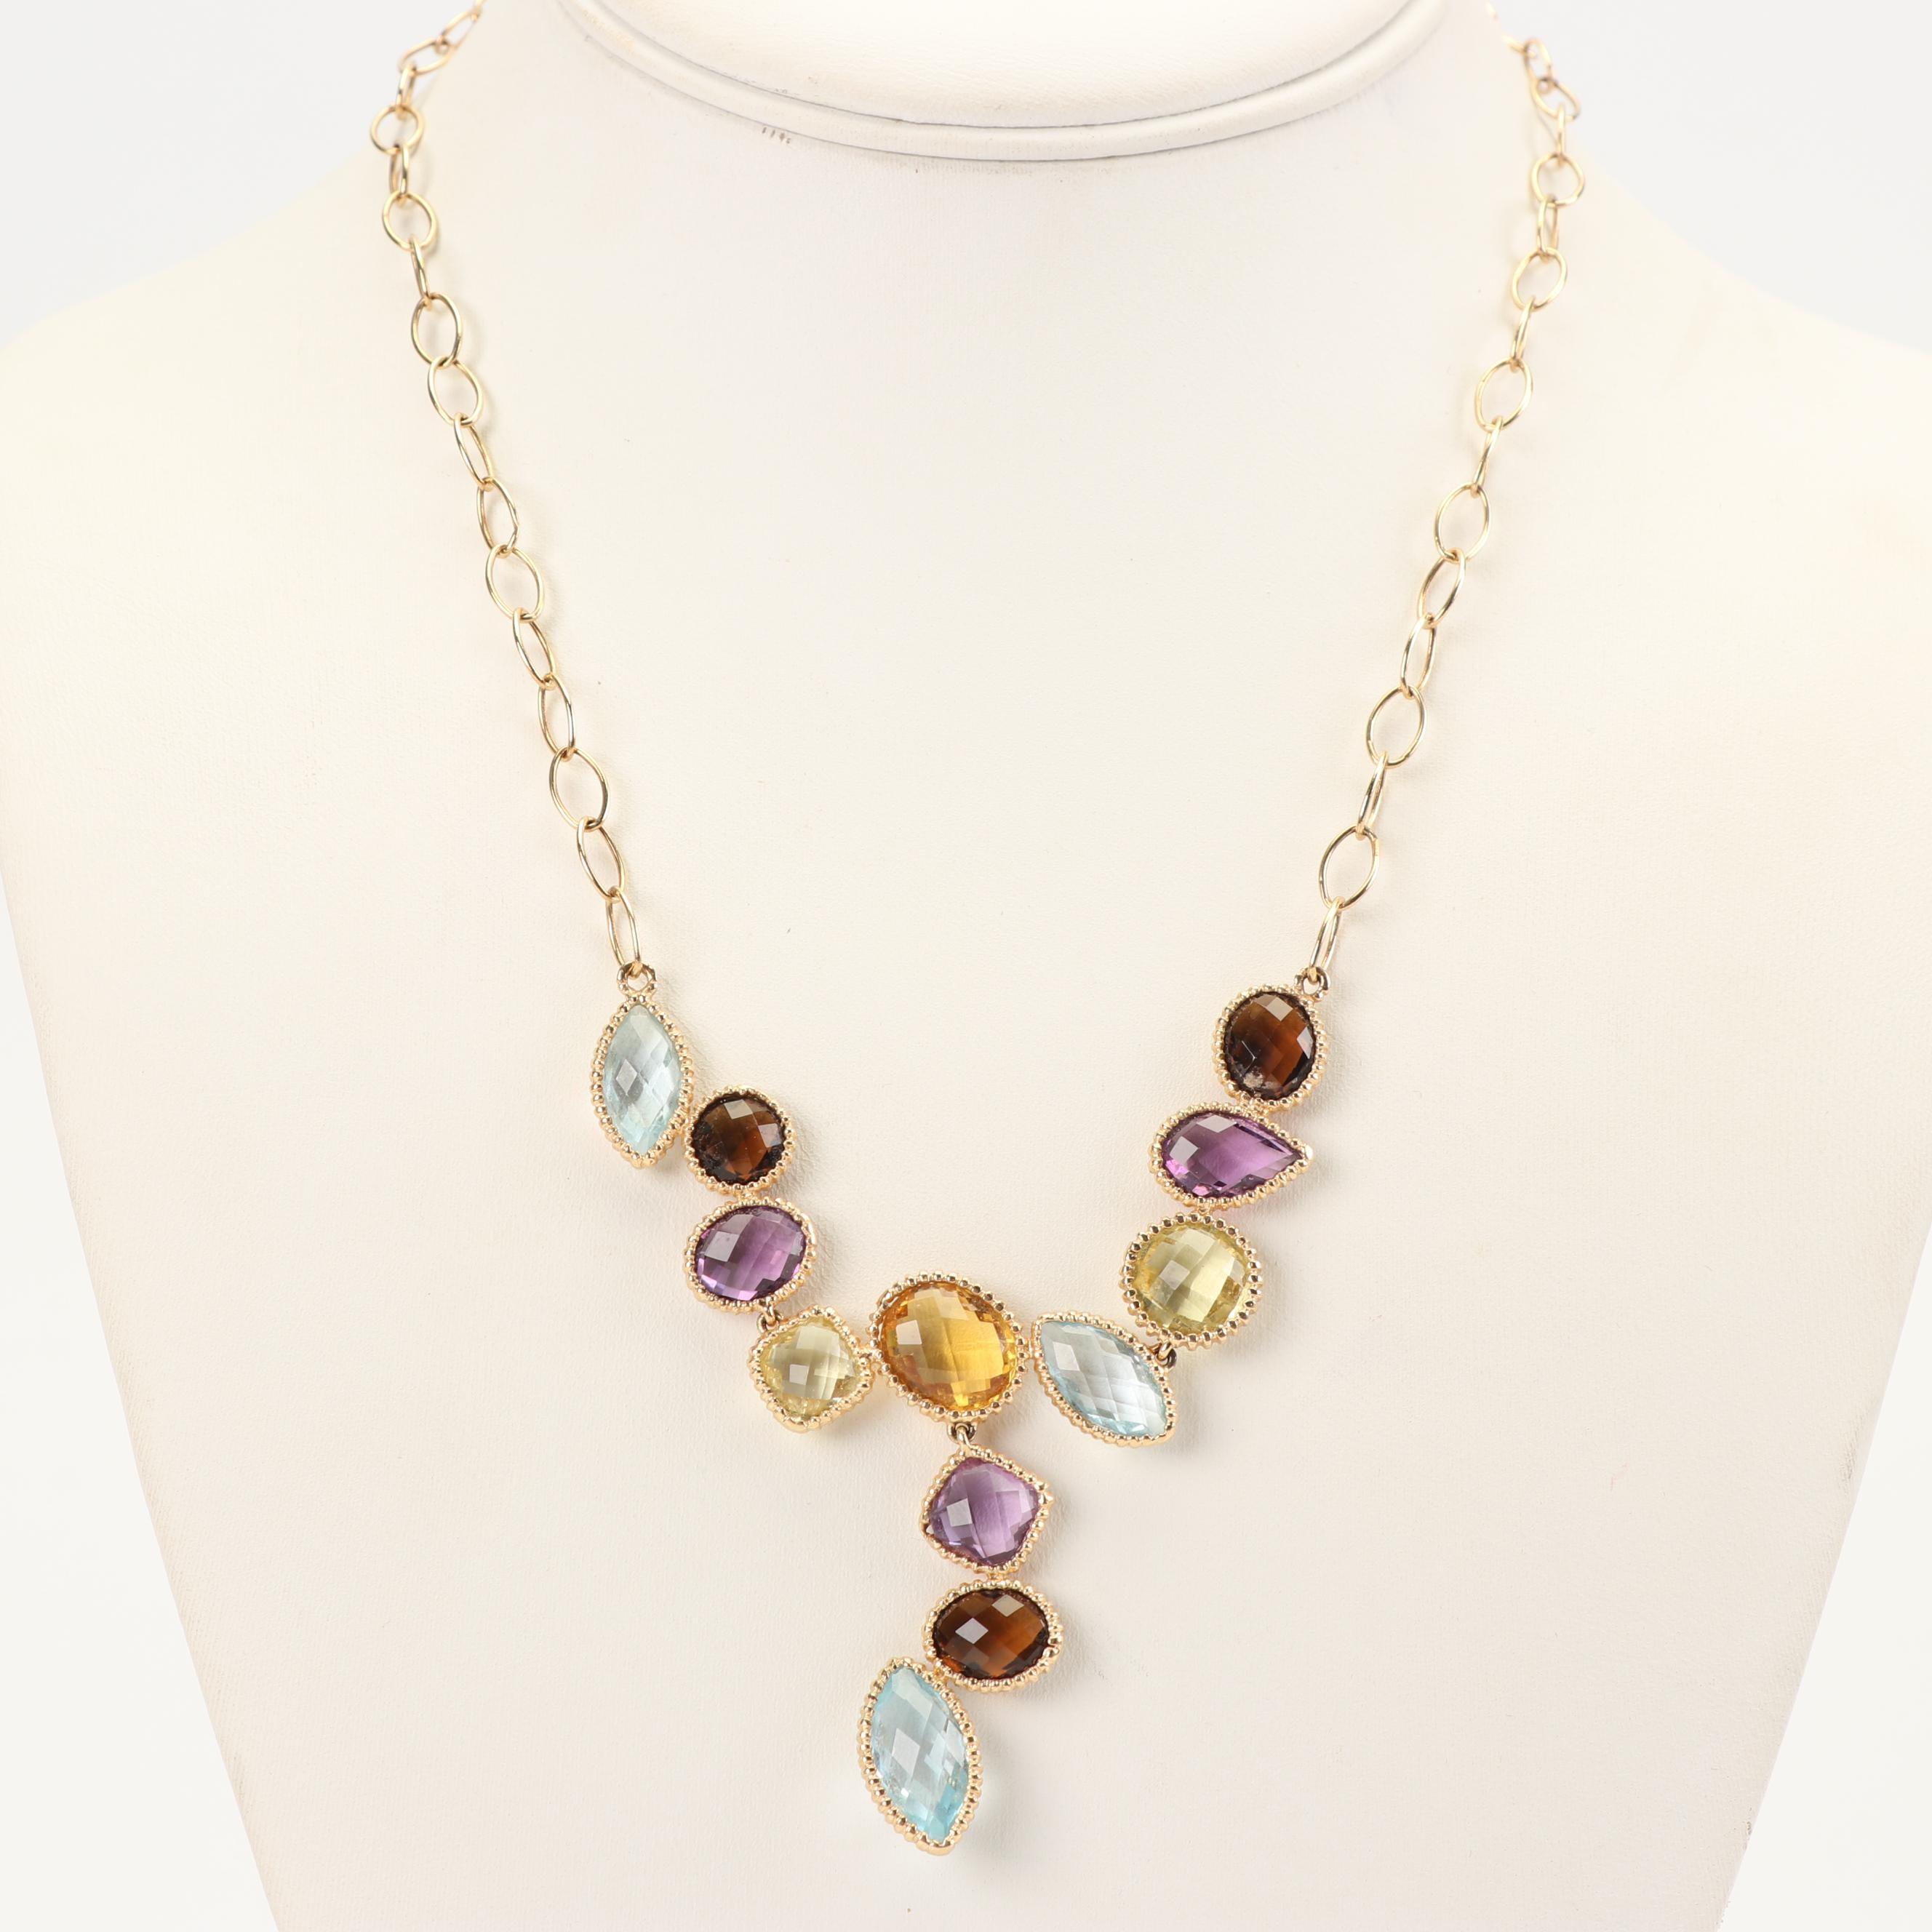 14K Yellow Gold Mixed Gemstone Statement Necklace